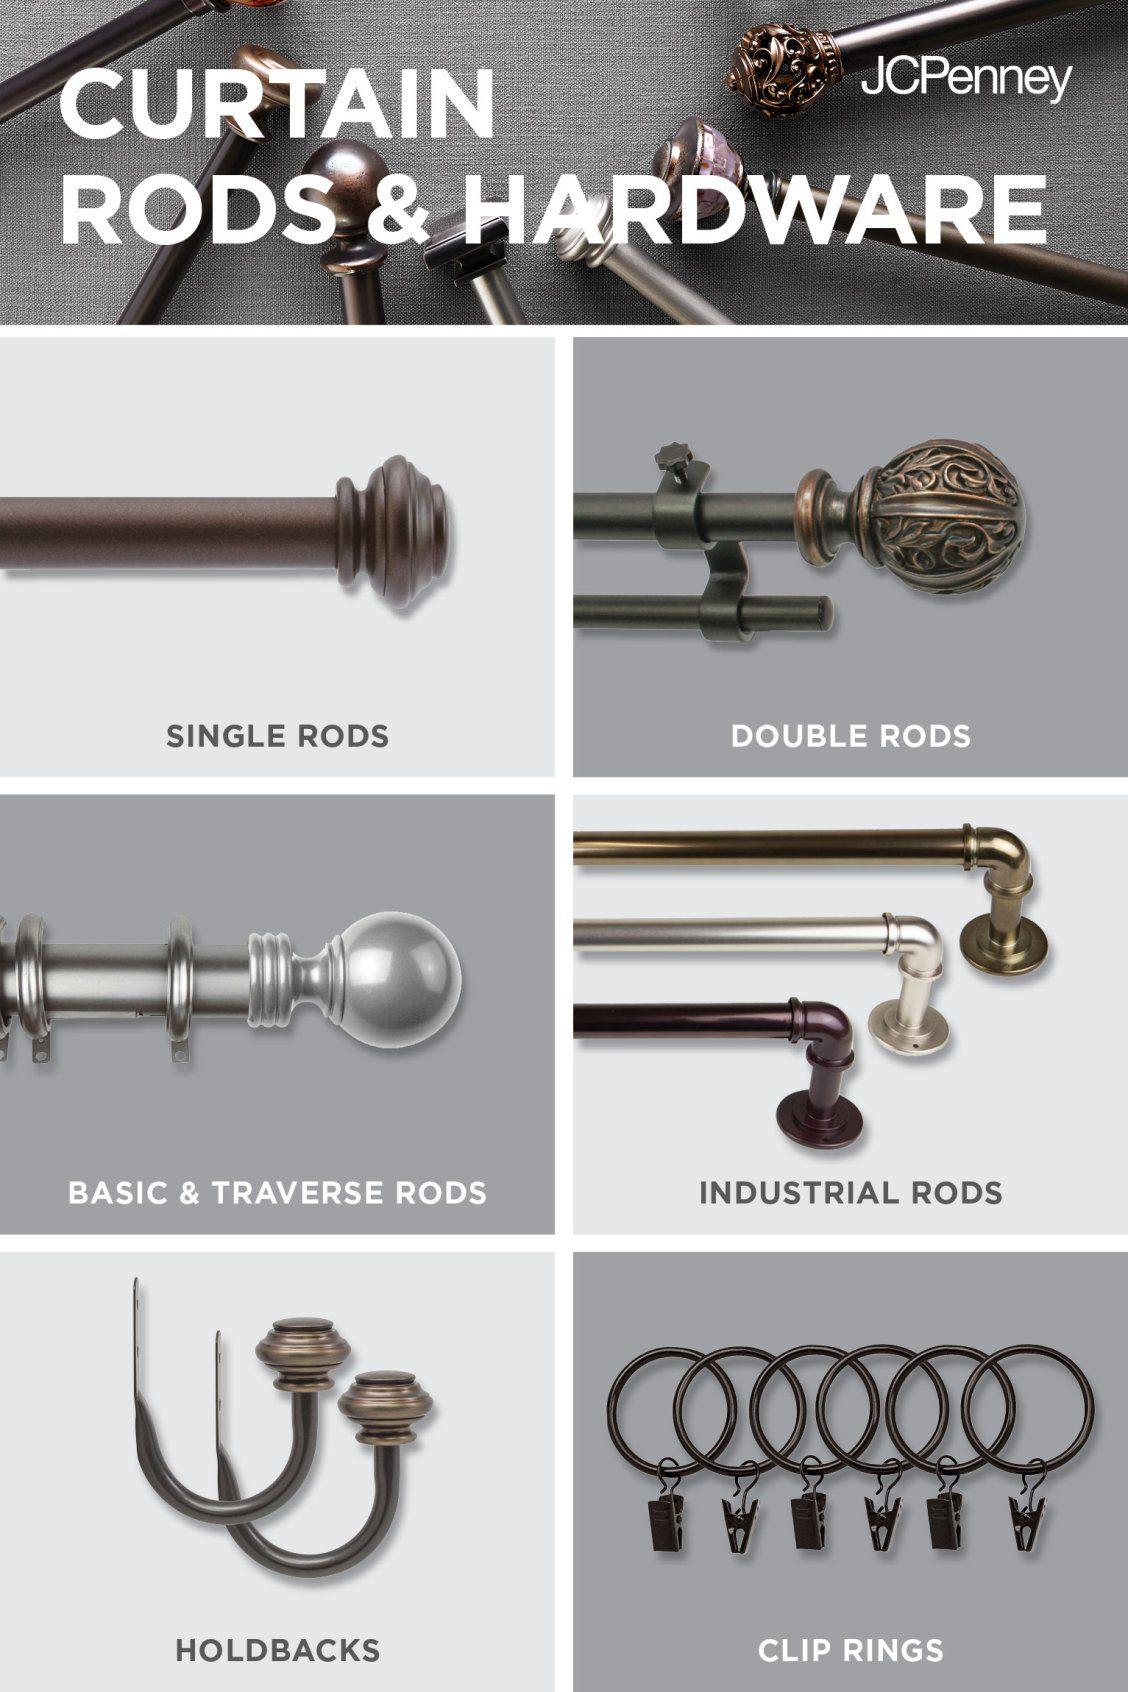 curtain rods hardware